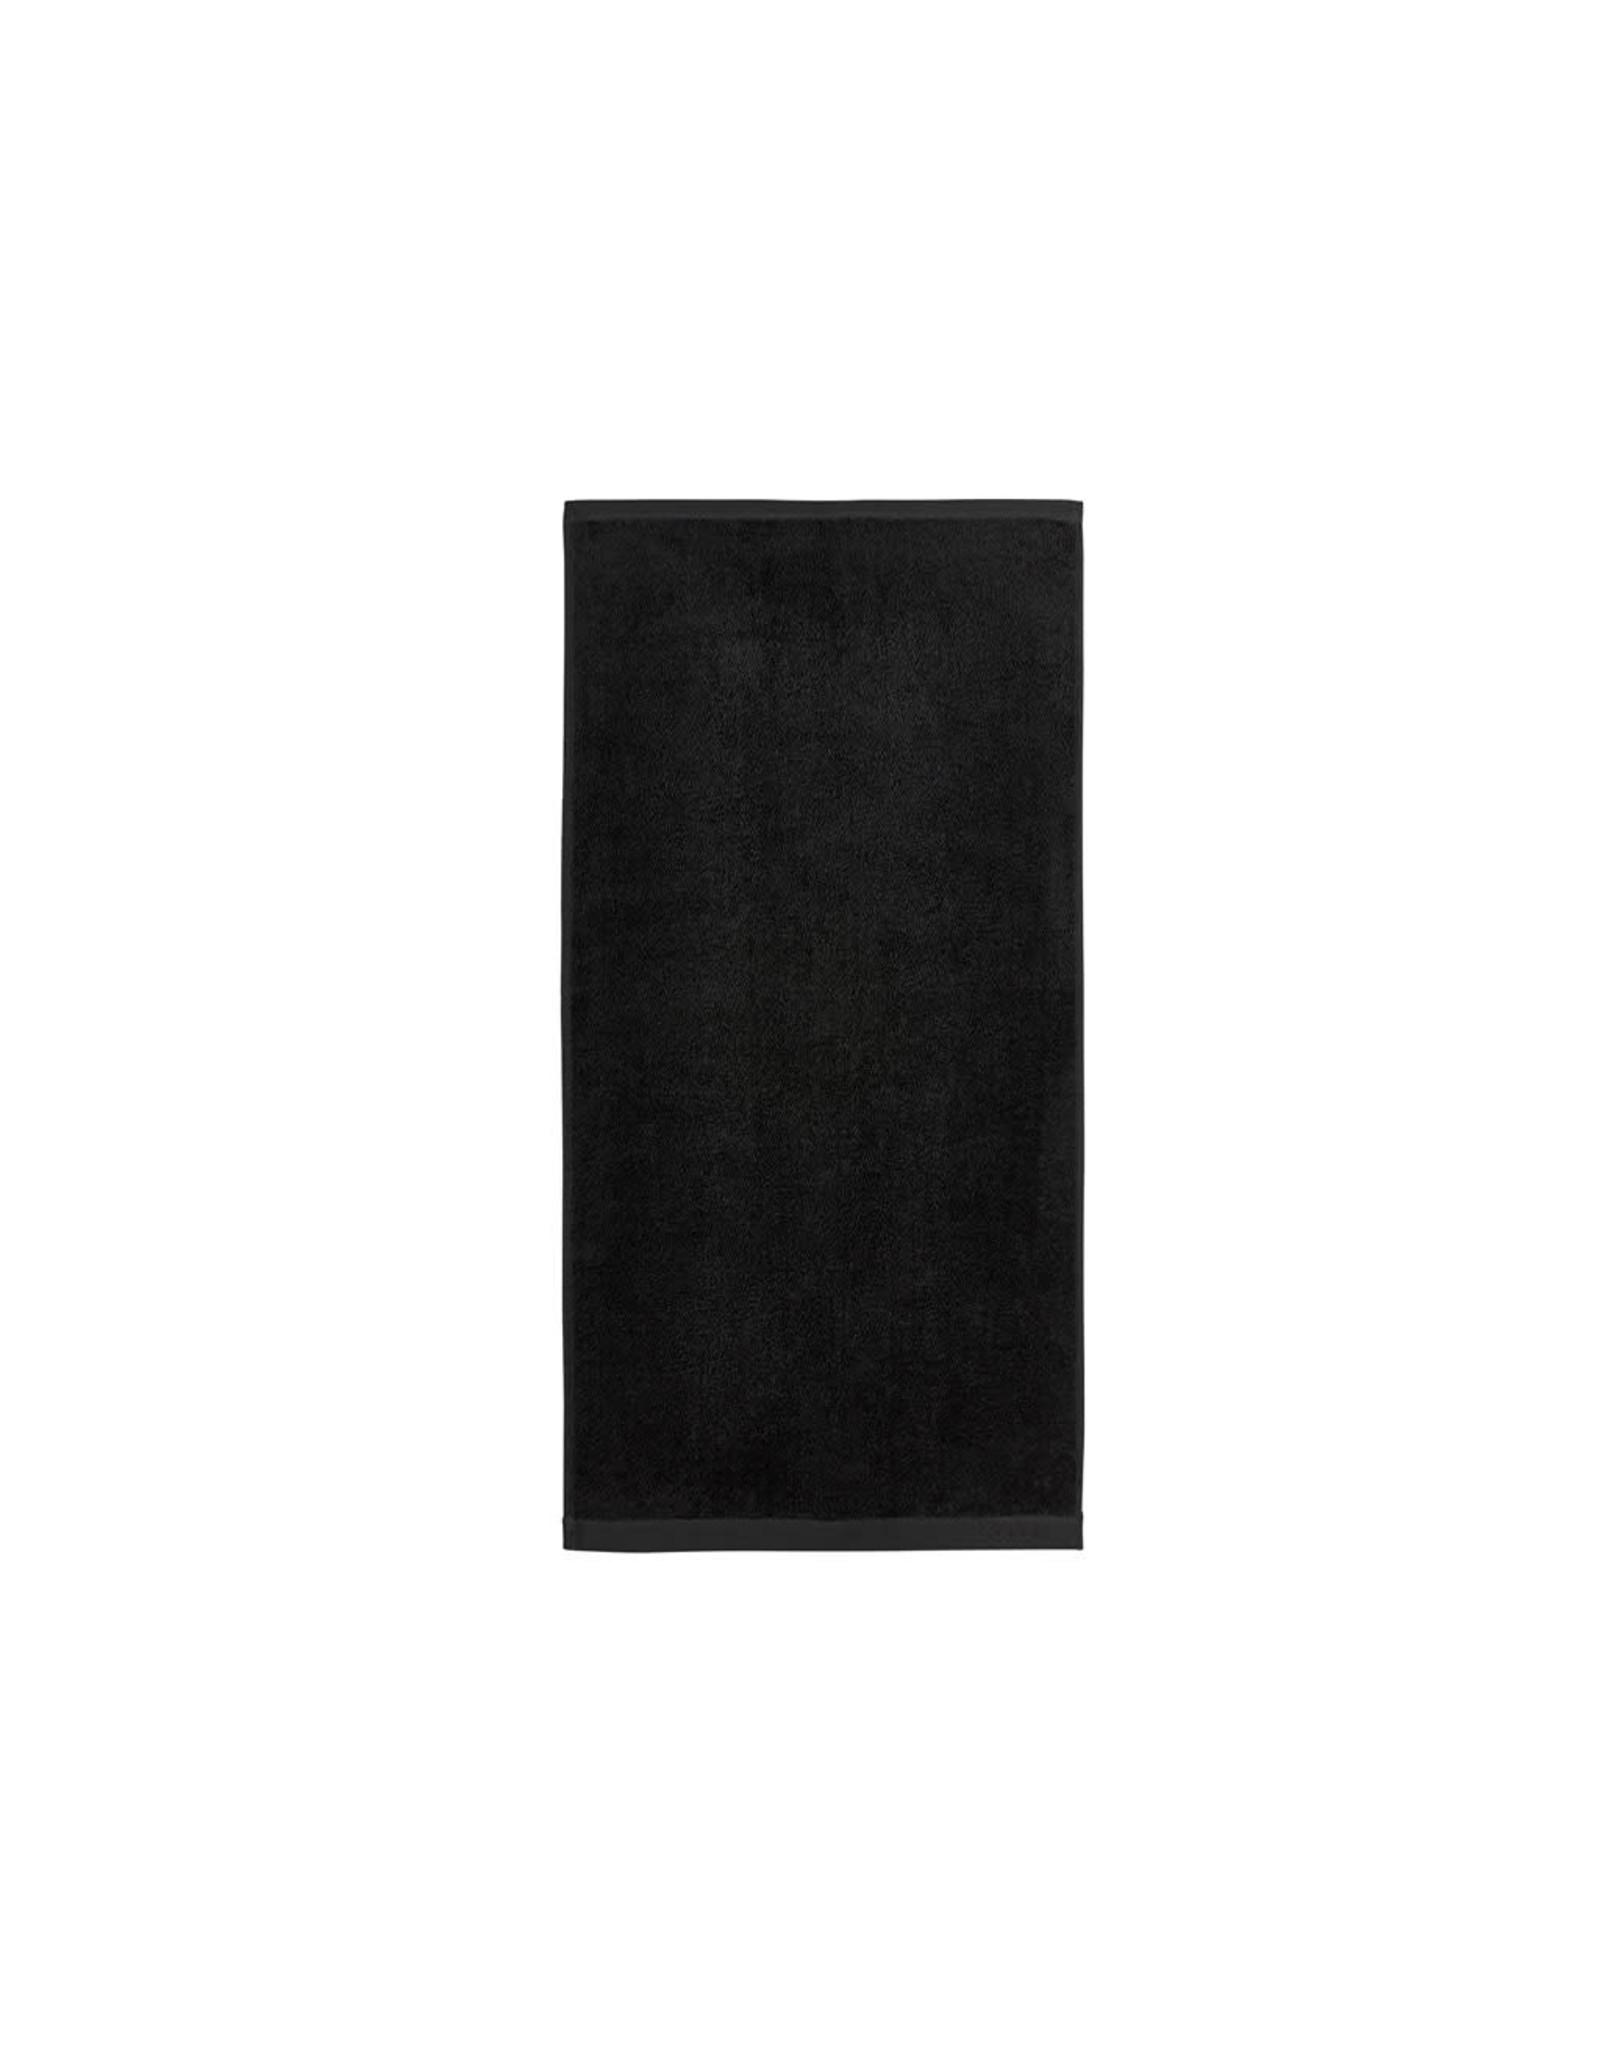 SODAHL SODAHL 727551 HANDDOEK 50X100CM COMFORT BLACK